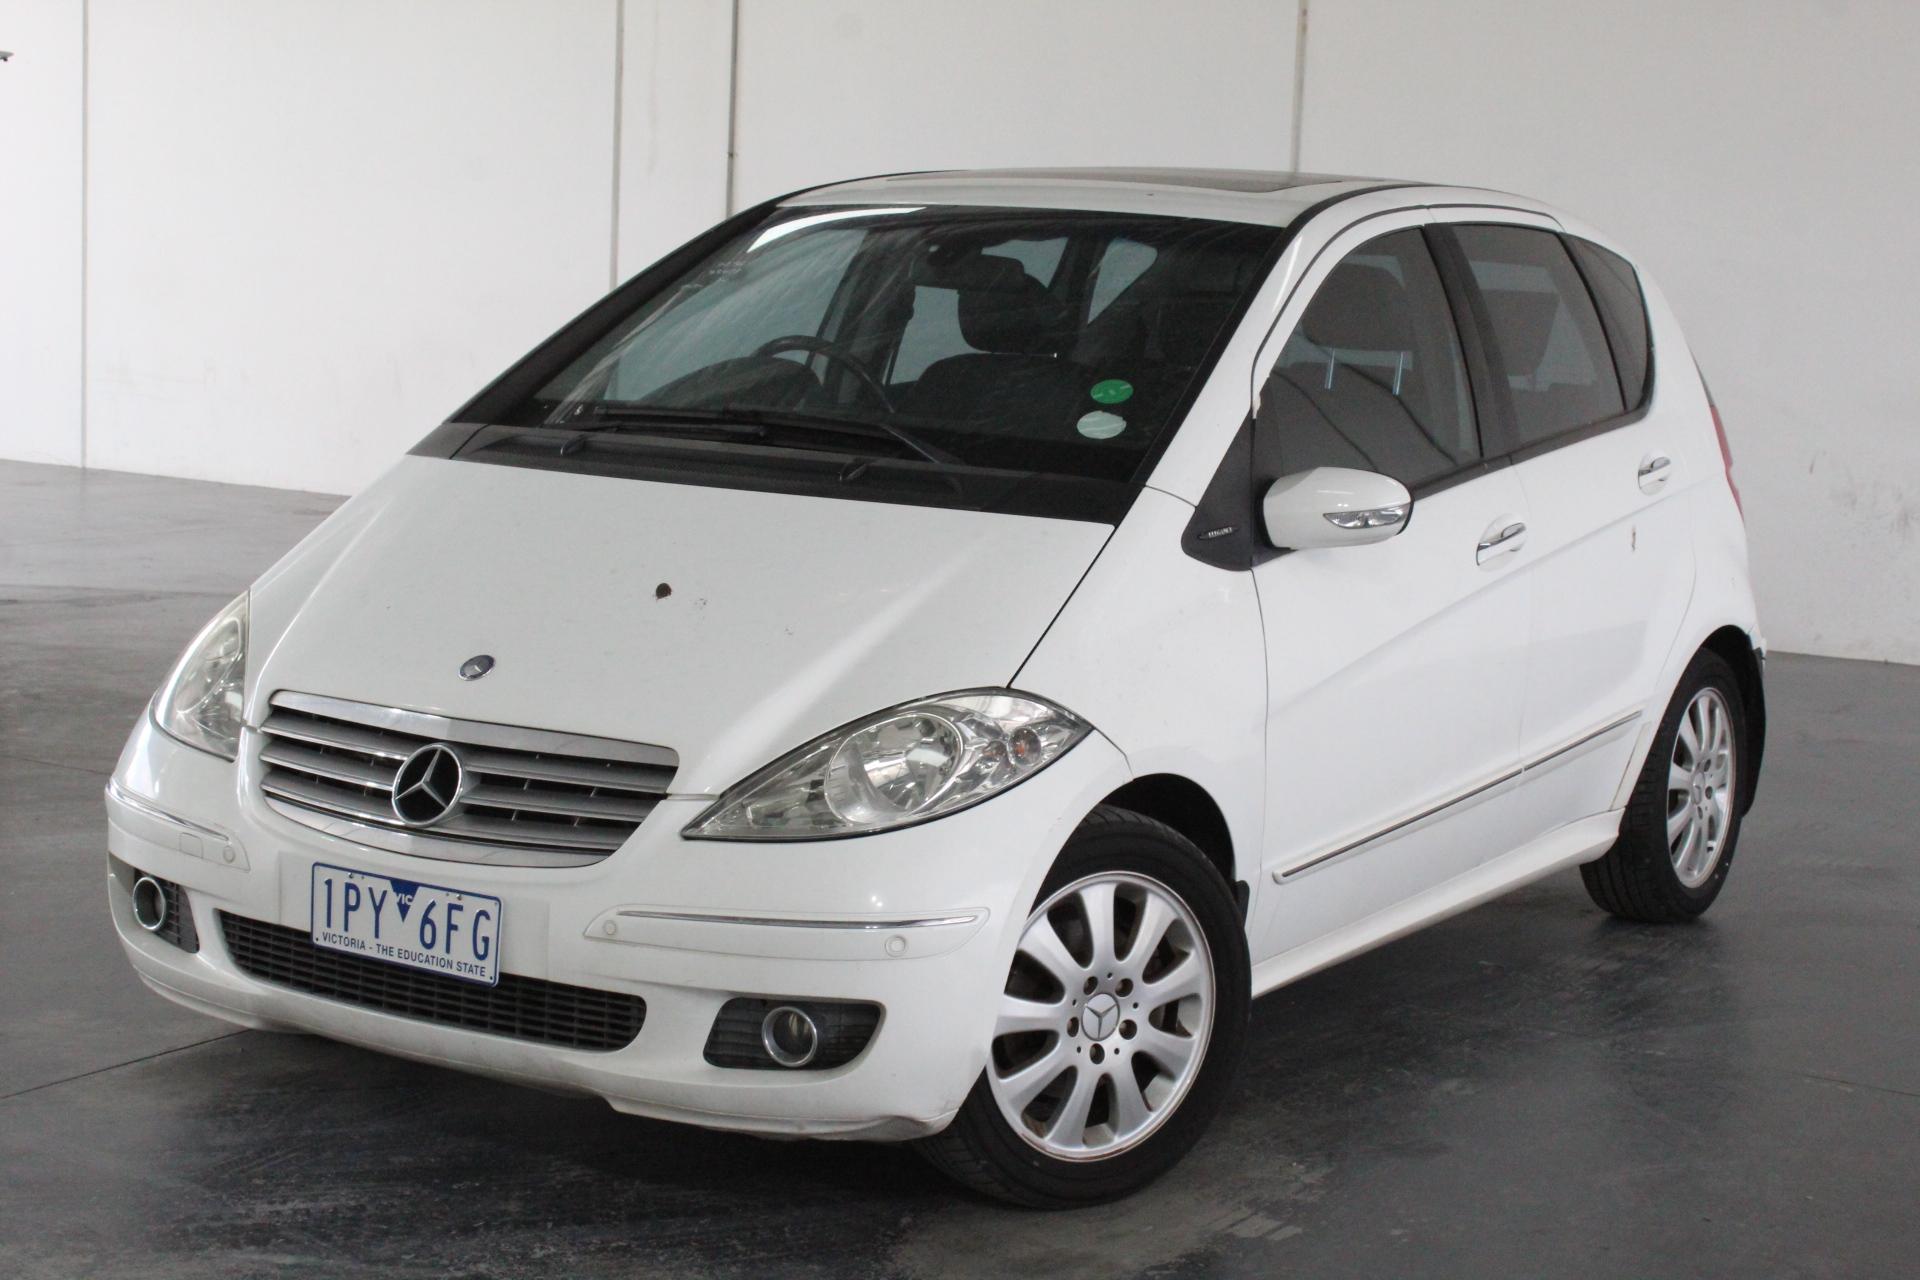 2005 Mercedes Benz A200 Elegance W169 CVT Hatchback